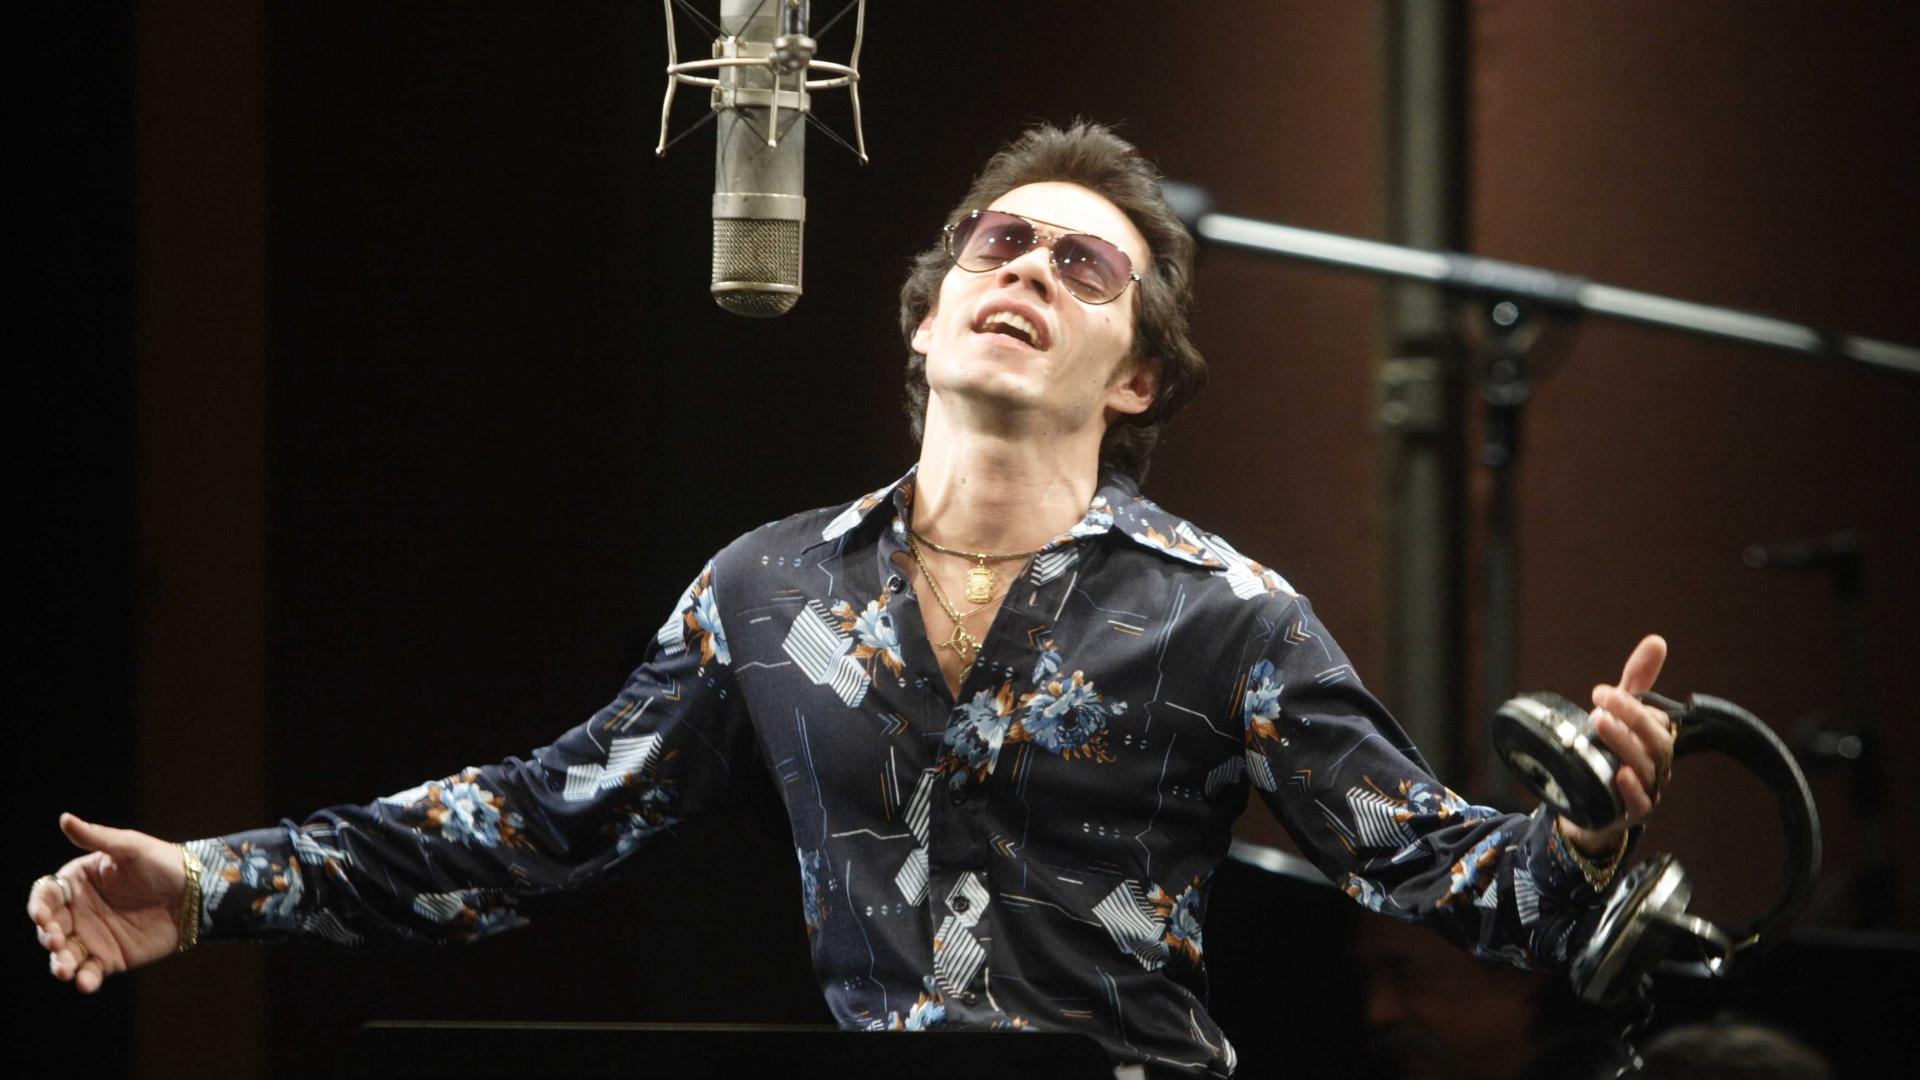 ... , photos, High Definition D: el cantante, hector lavoe, marc anthony